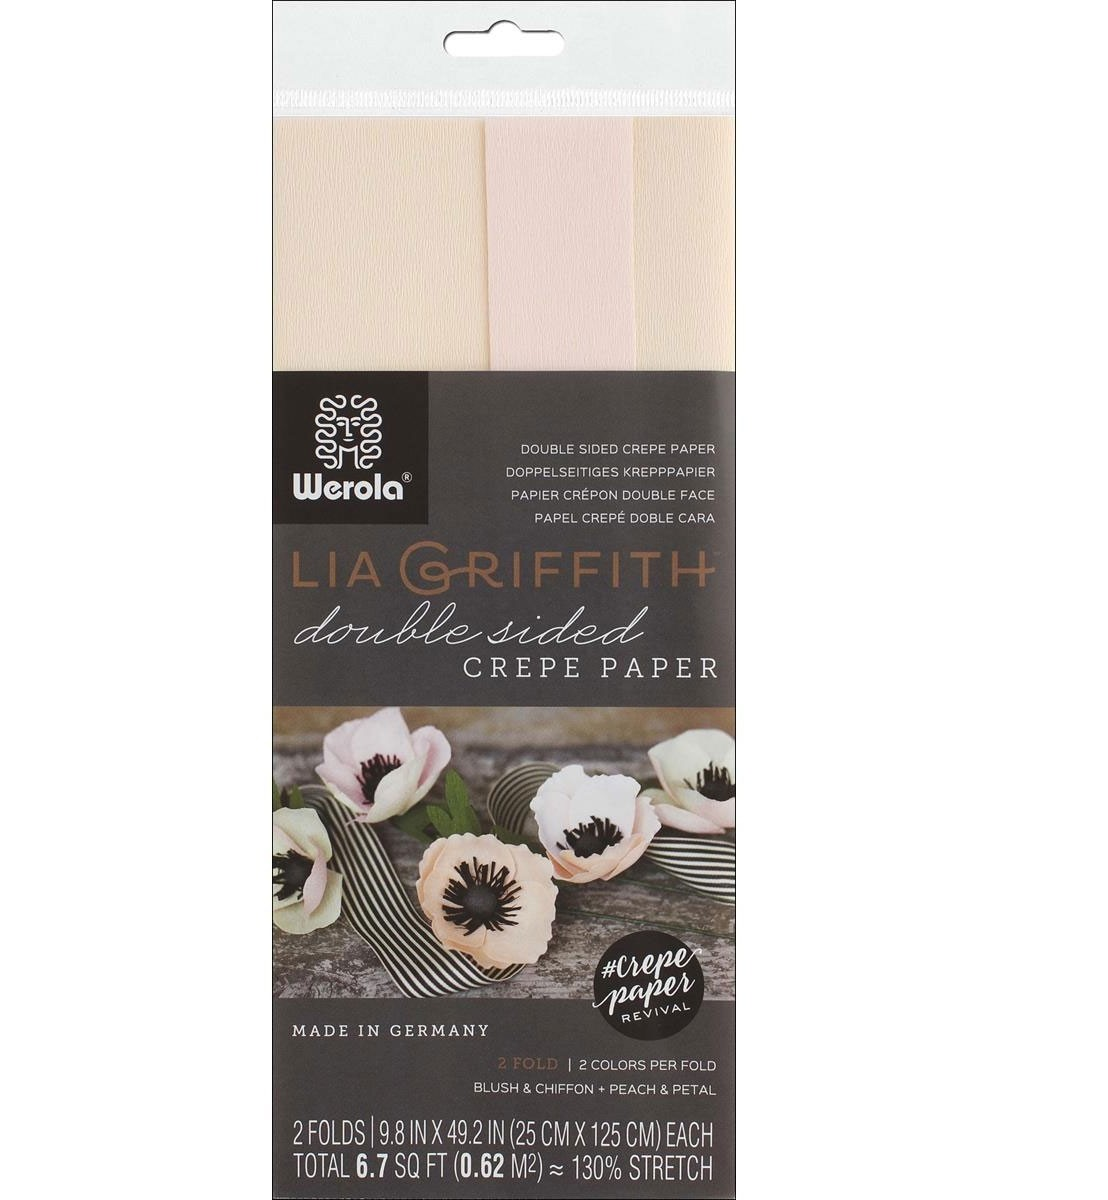 doublette crepe paper - blush & chiffon and peach & petal